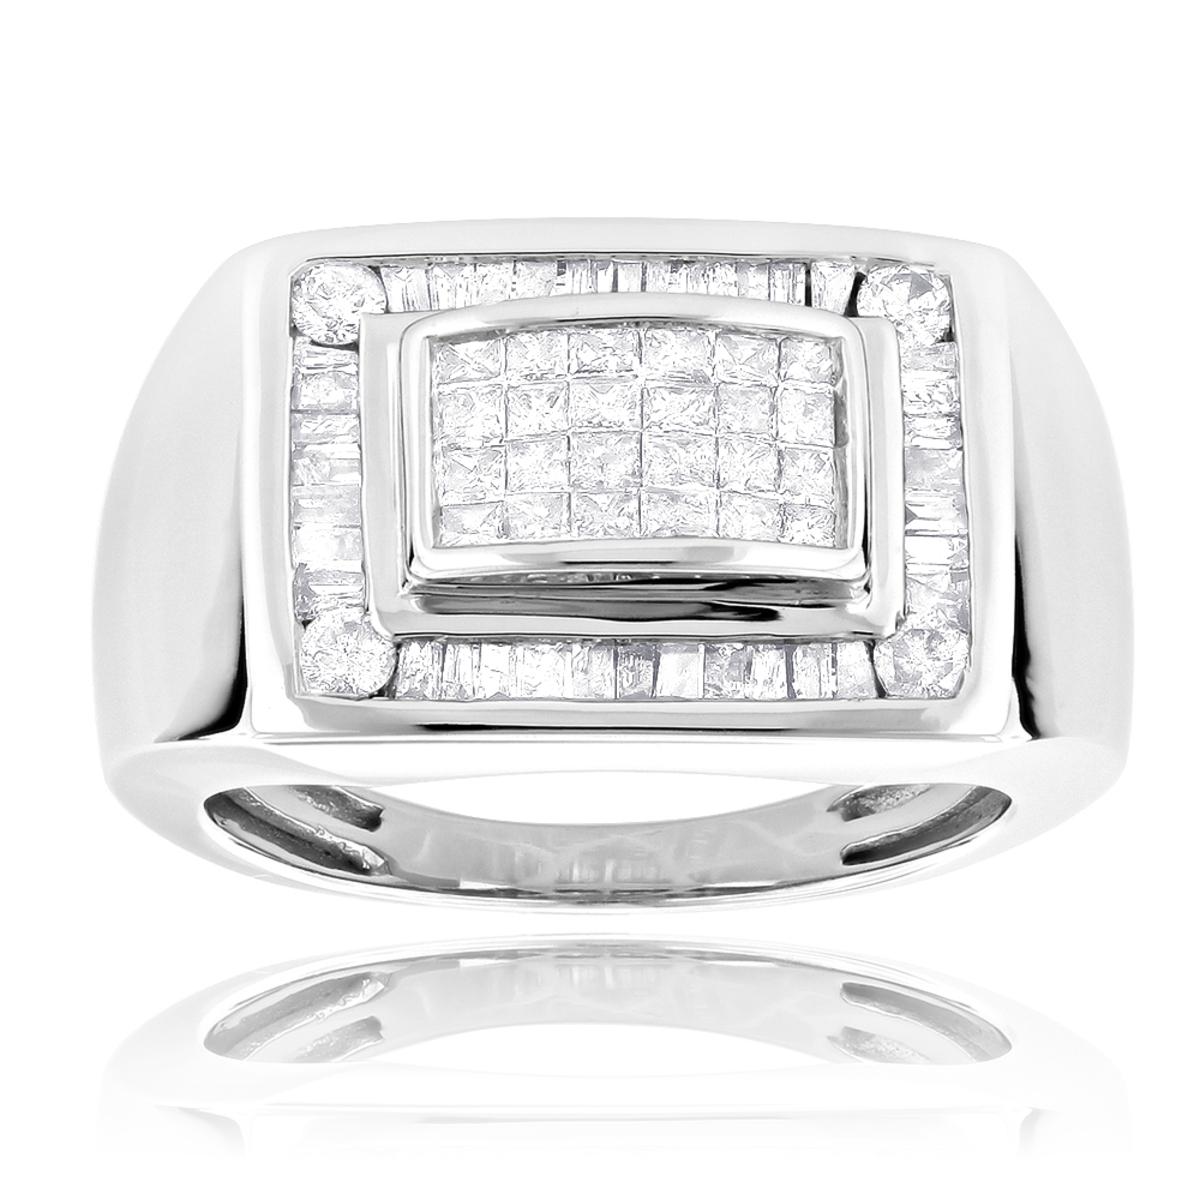 14k Gold Men's Diamond Ring Princess Baguettes 1.4ct